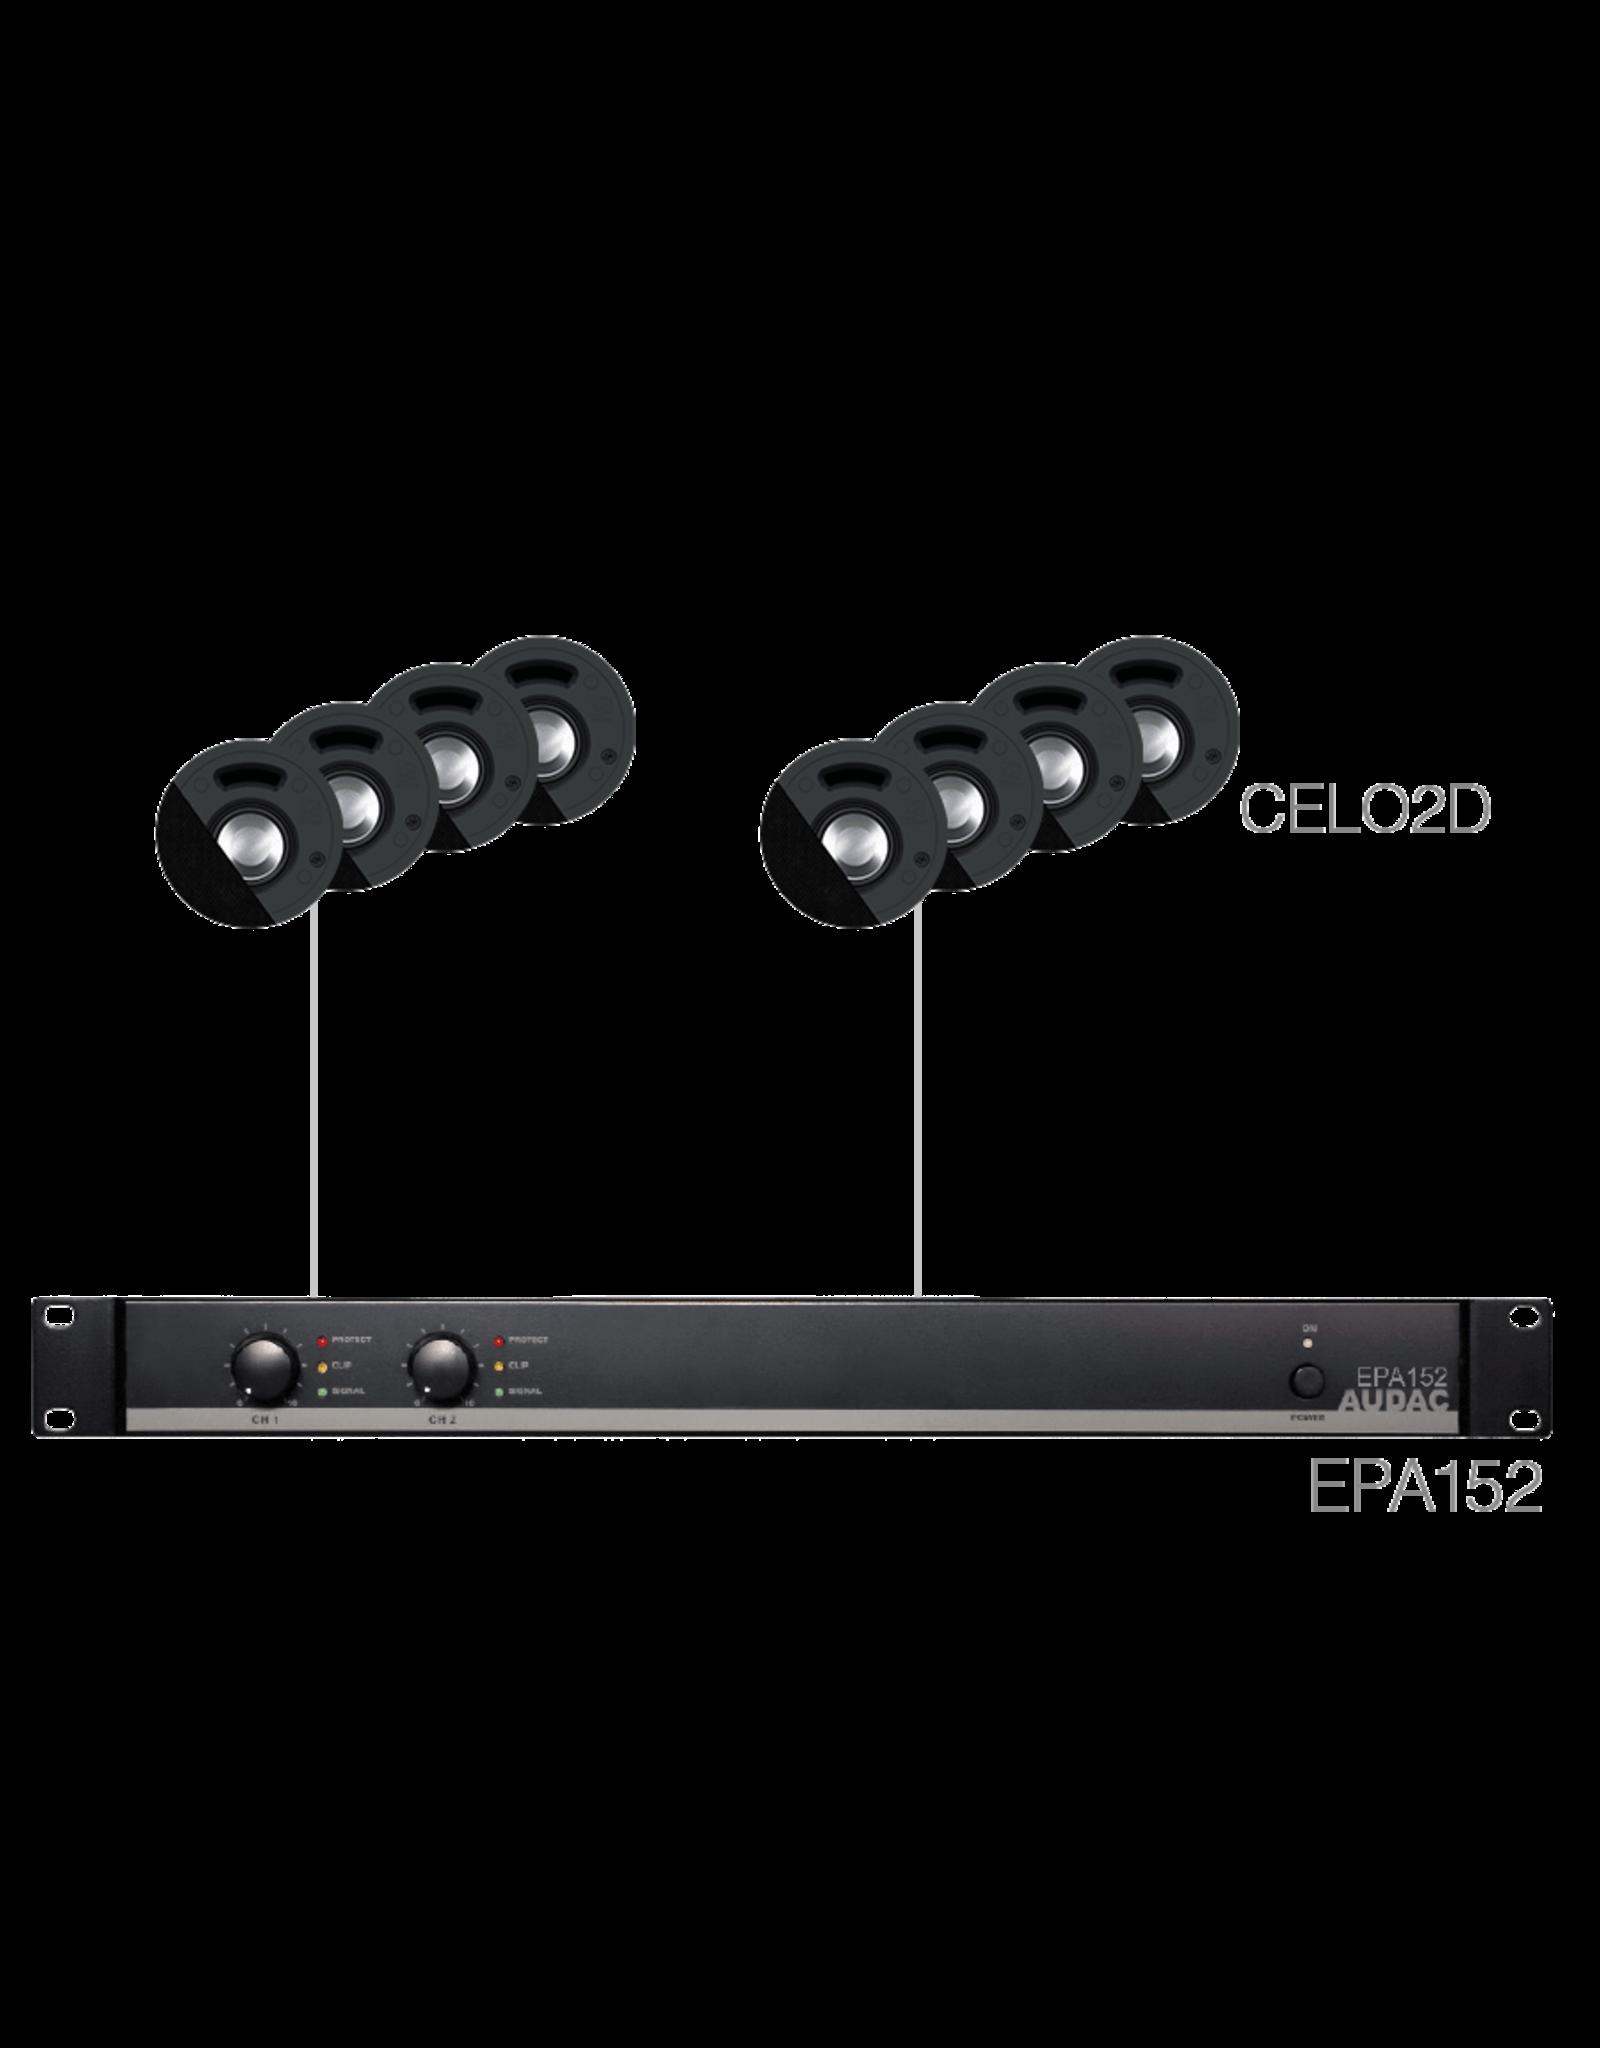 Audac 8 x CELO2D + EPA152 Black